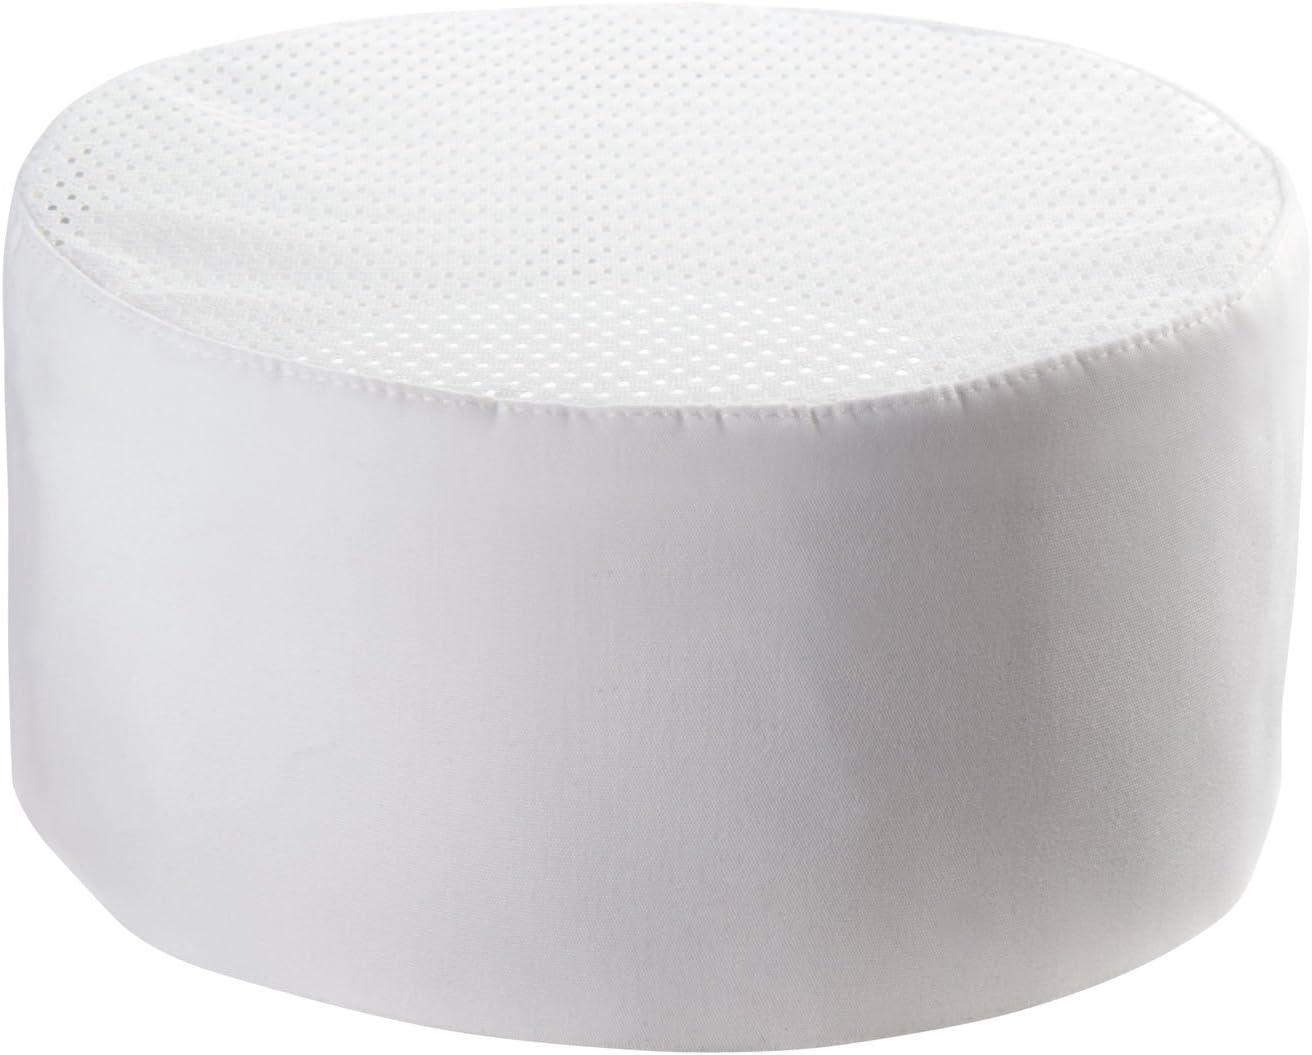 Chefwear Chef Hat Selling Adjustable Skull Ha Top Max 41% OFF Cap Bakers Mesh